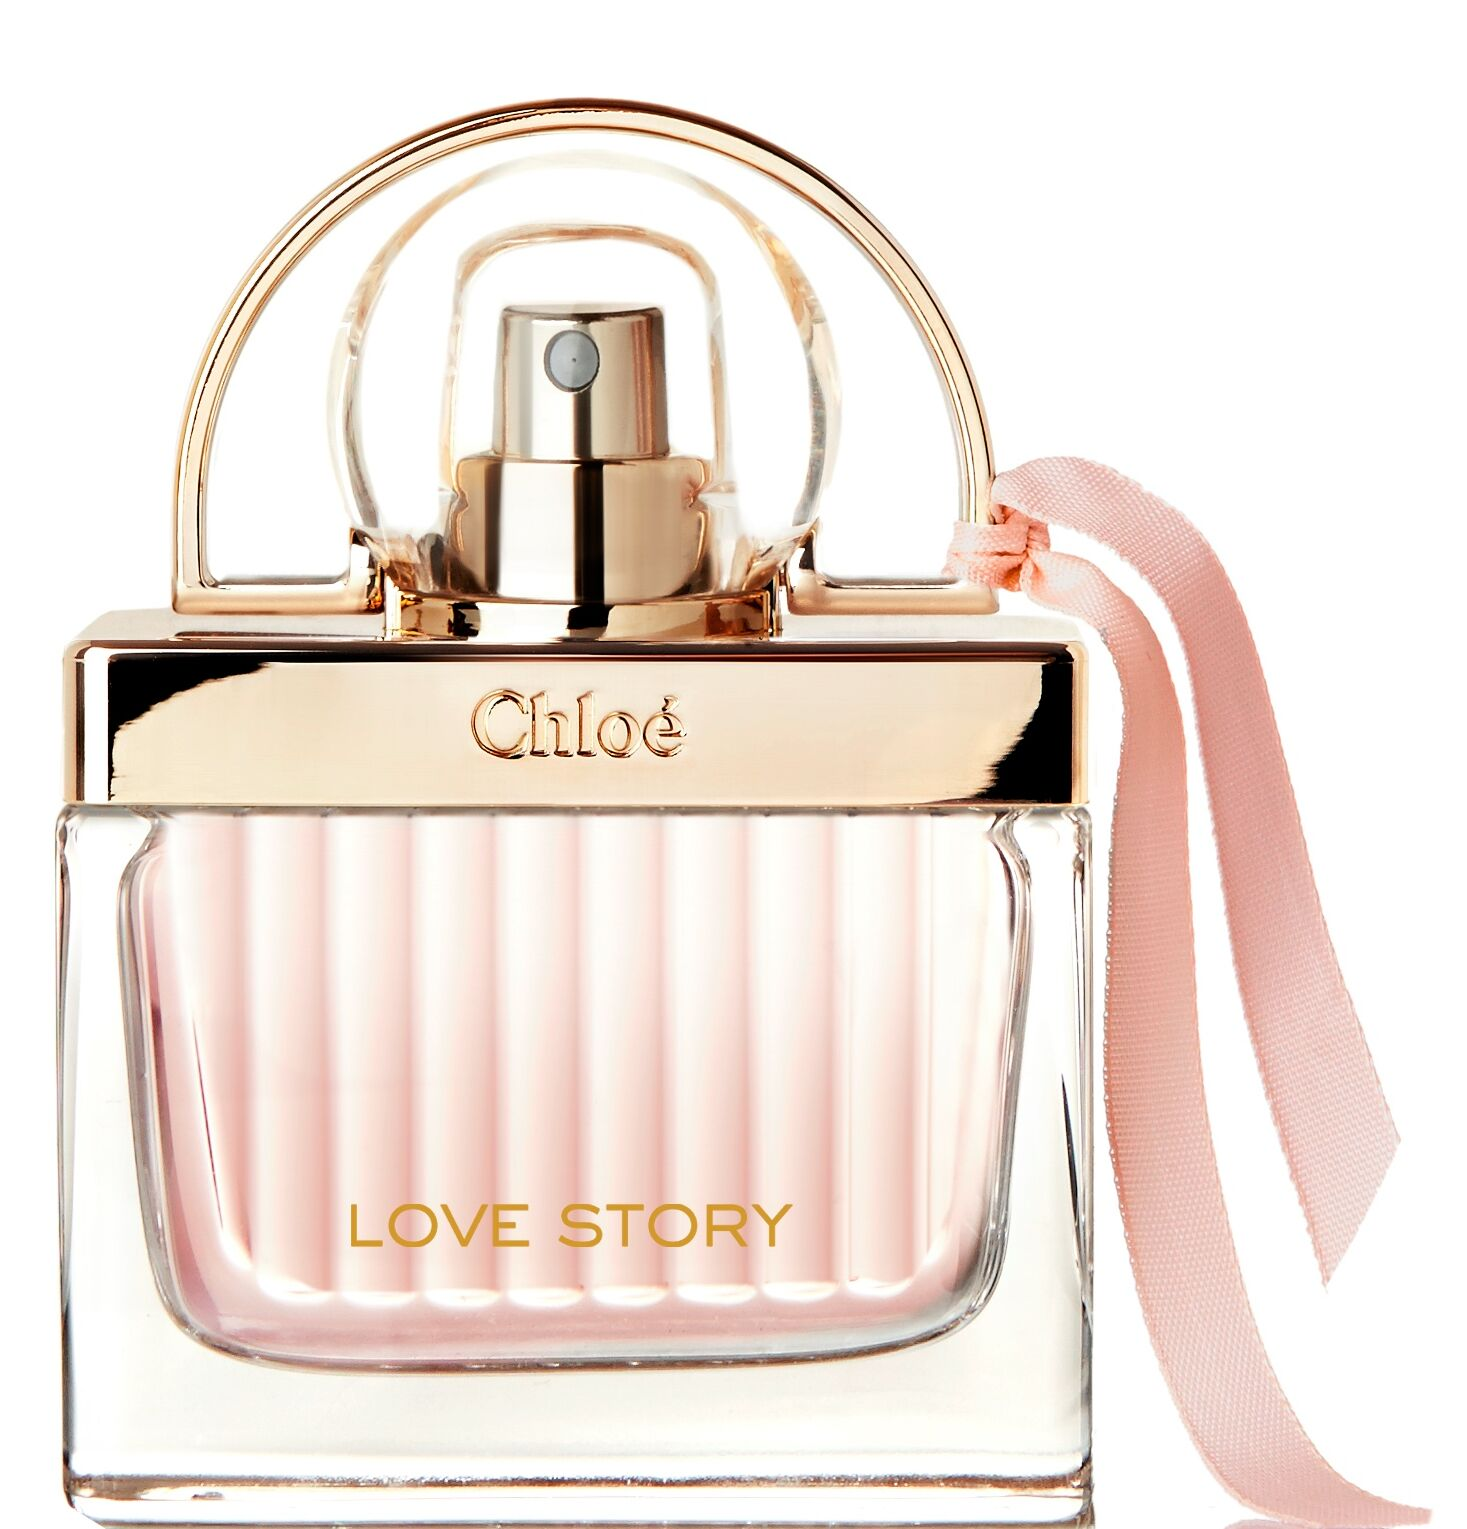 Chloe Love Story EDT, 30 ml